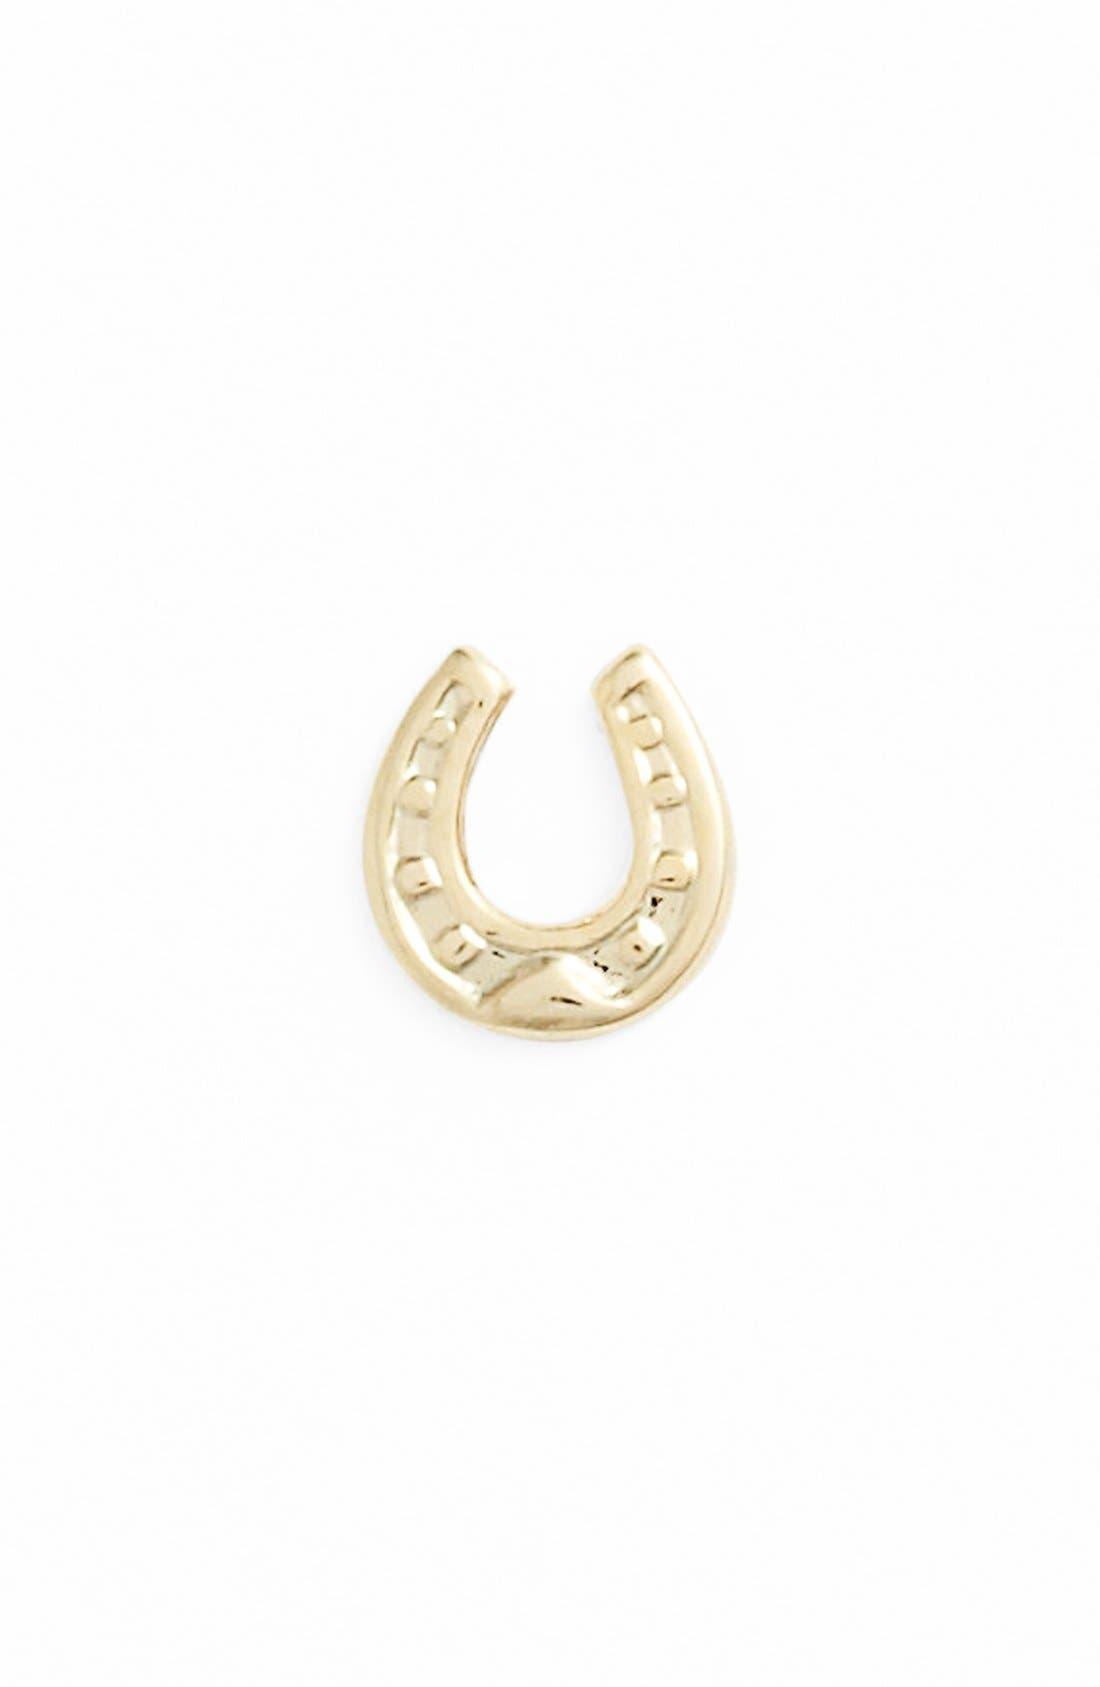 Main Image - Bonnie Jonas 'Horseshoe' Stud Earring